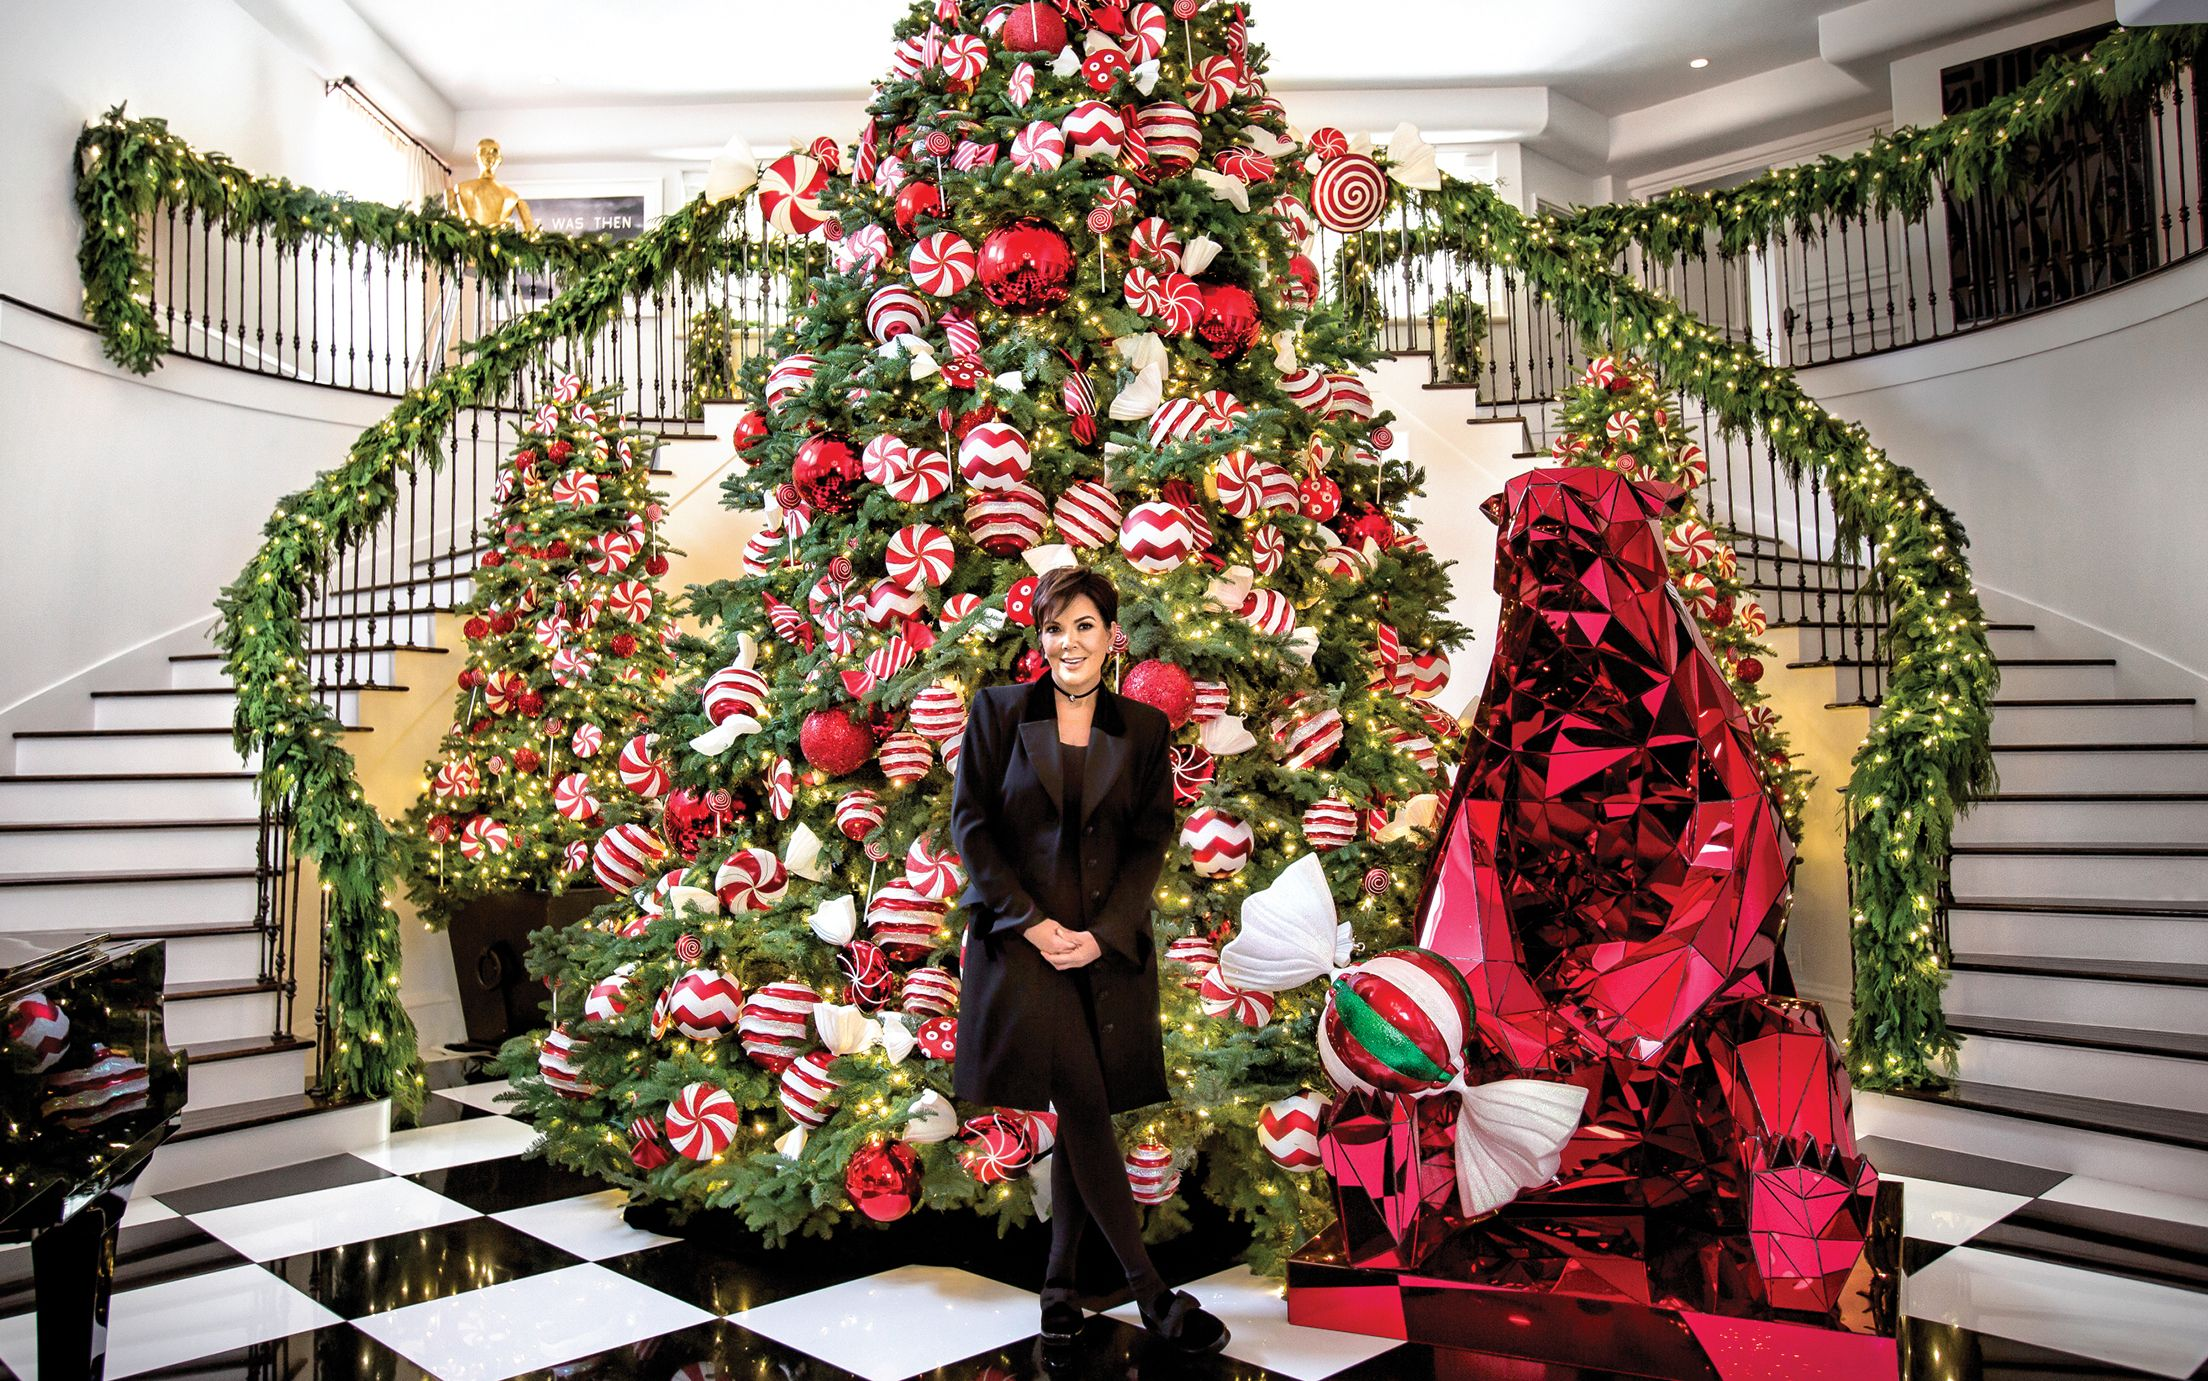 bryan rafanelli white house christmas